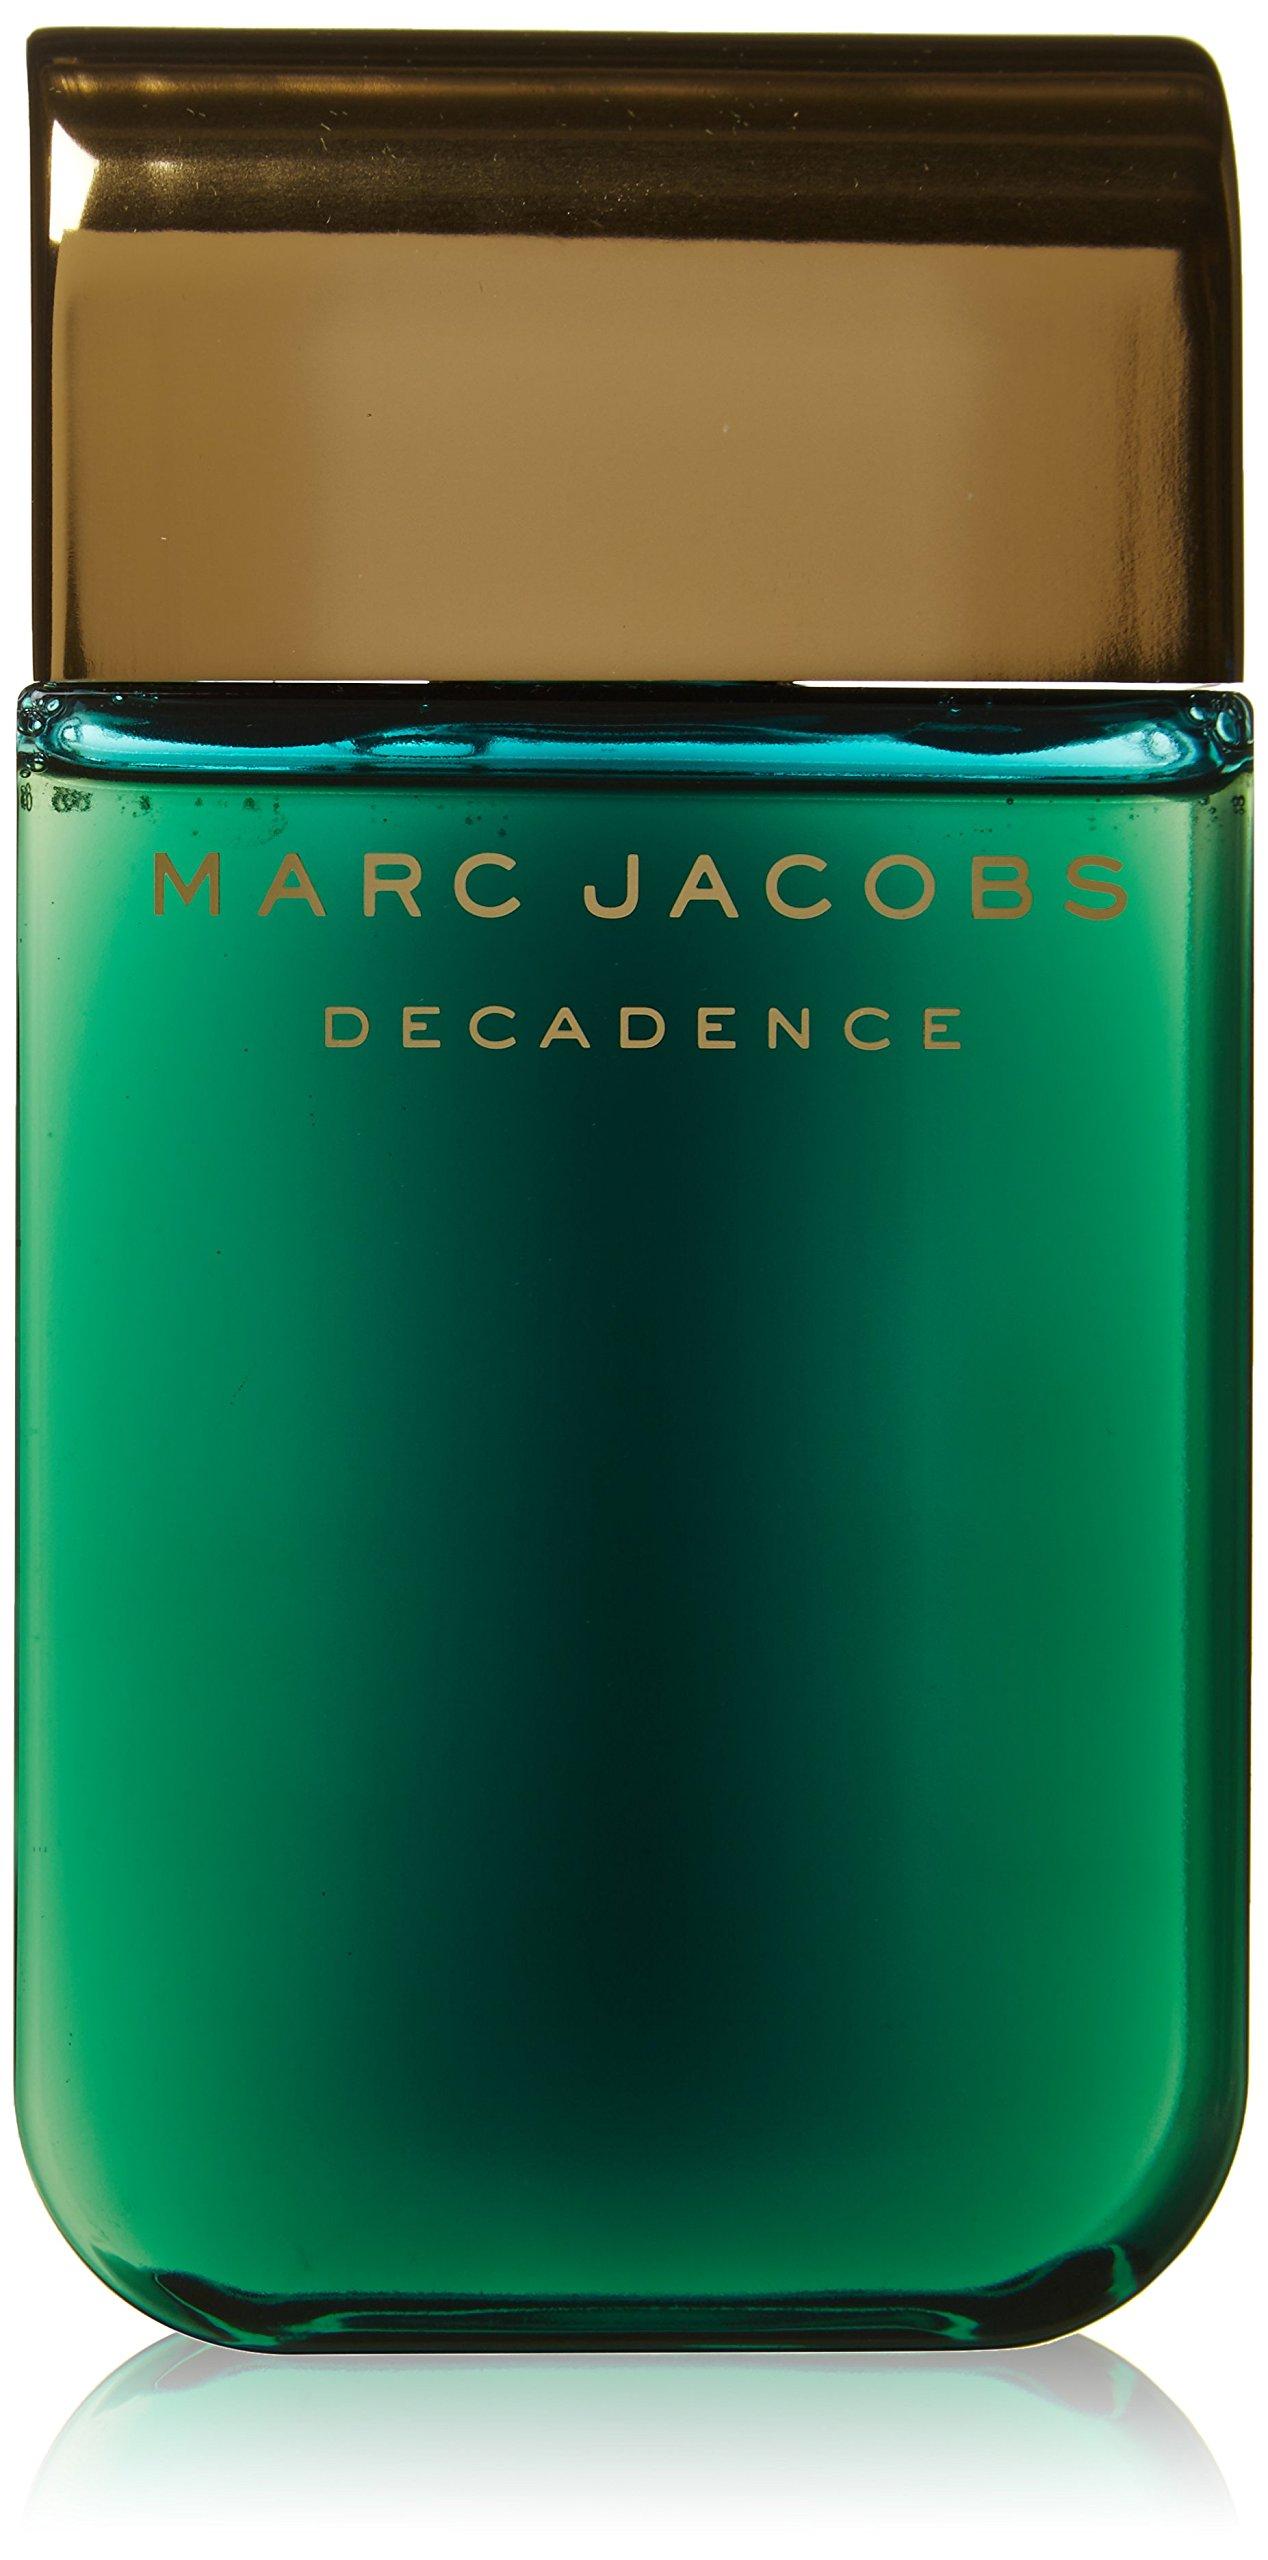 Marc Jacobs Decadence Shower Gel